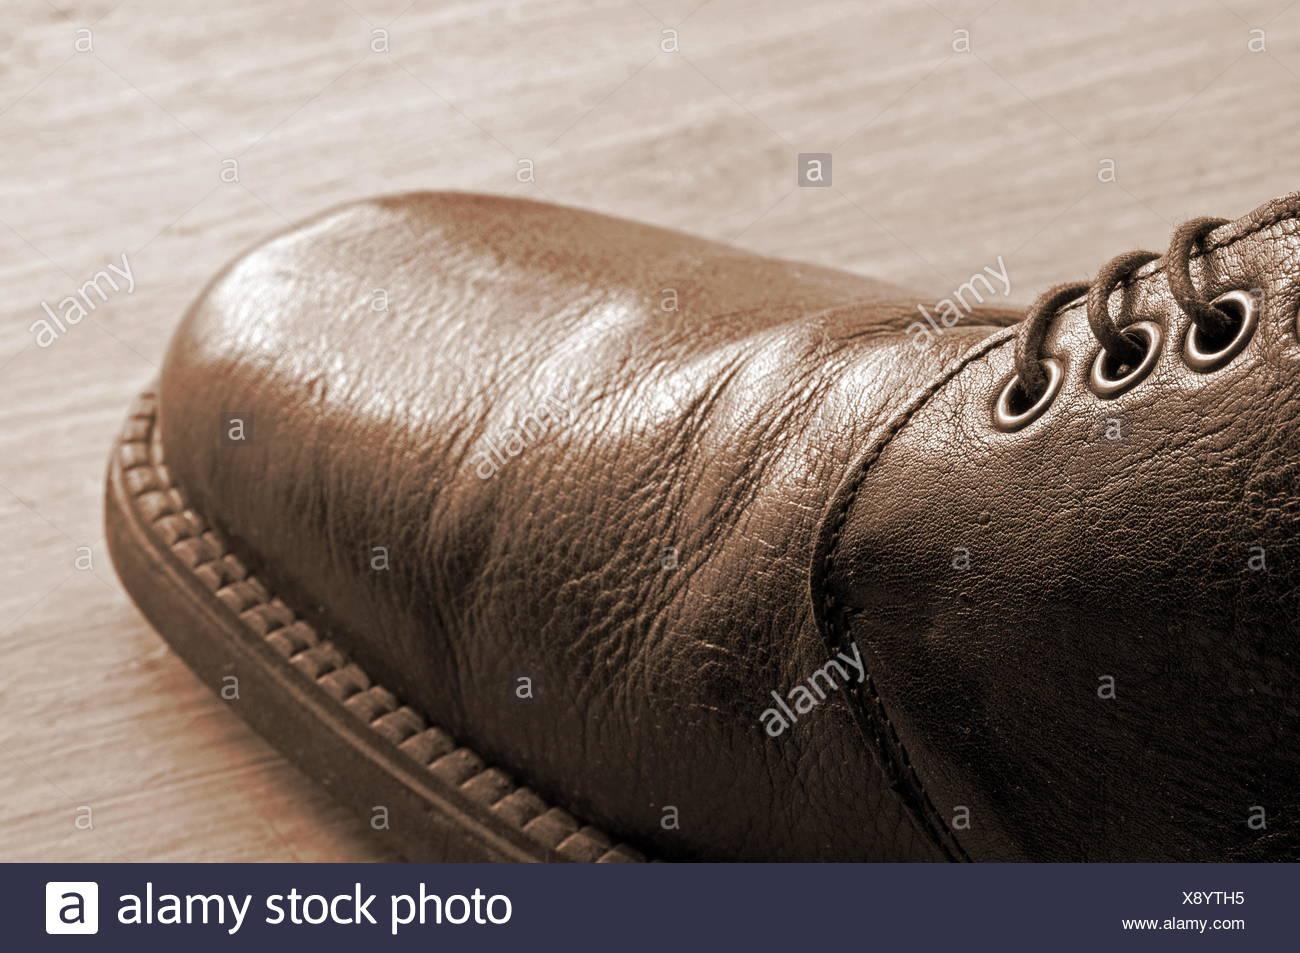 leather shoe antique-style - Stock Image